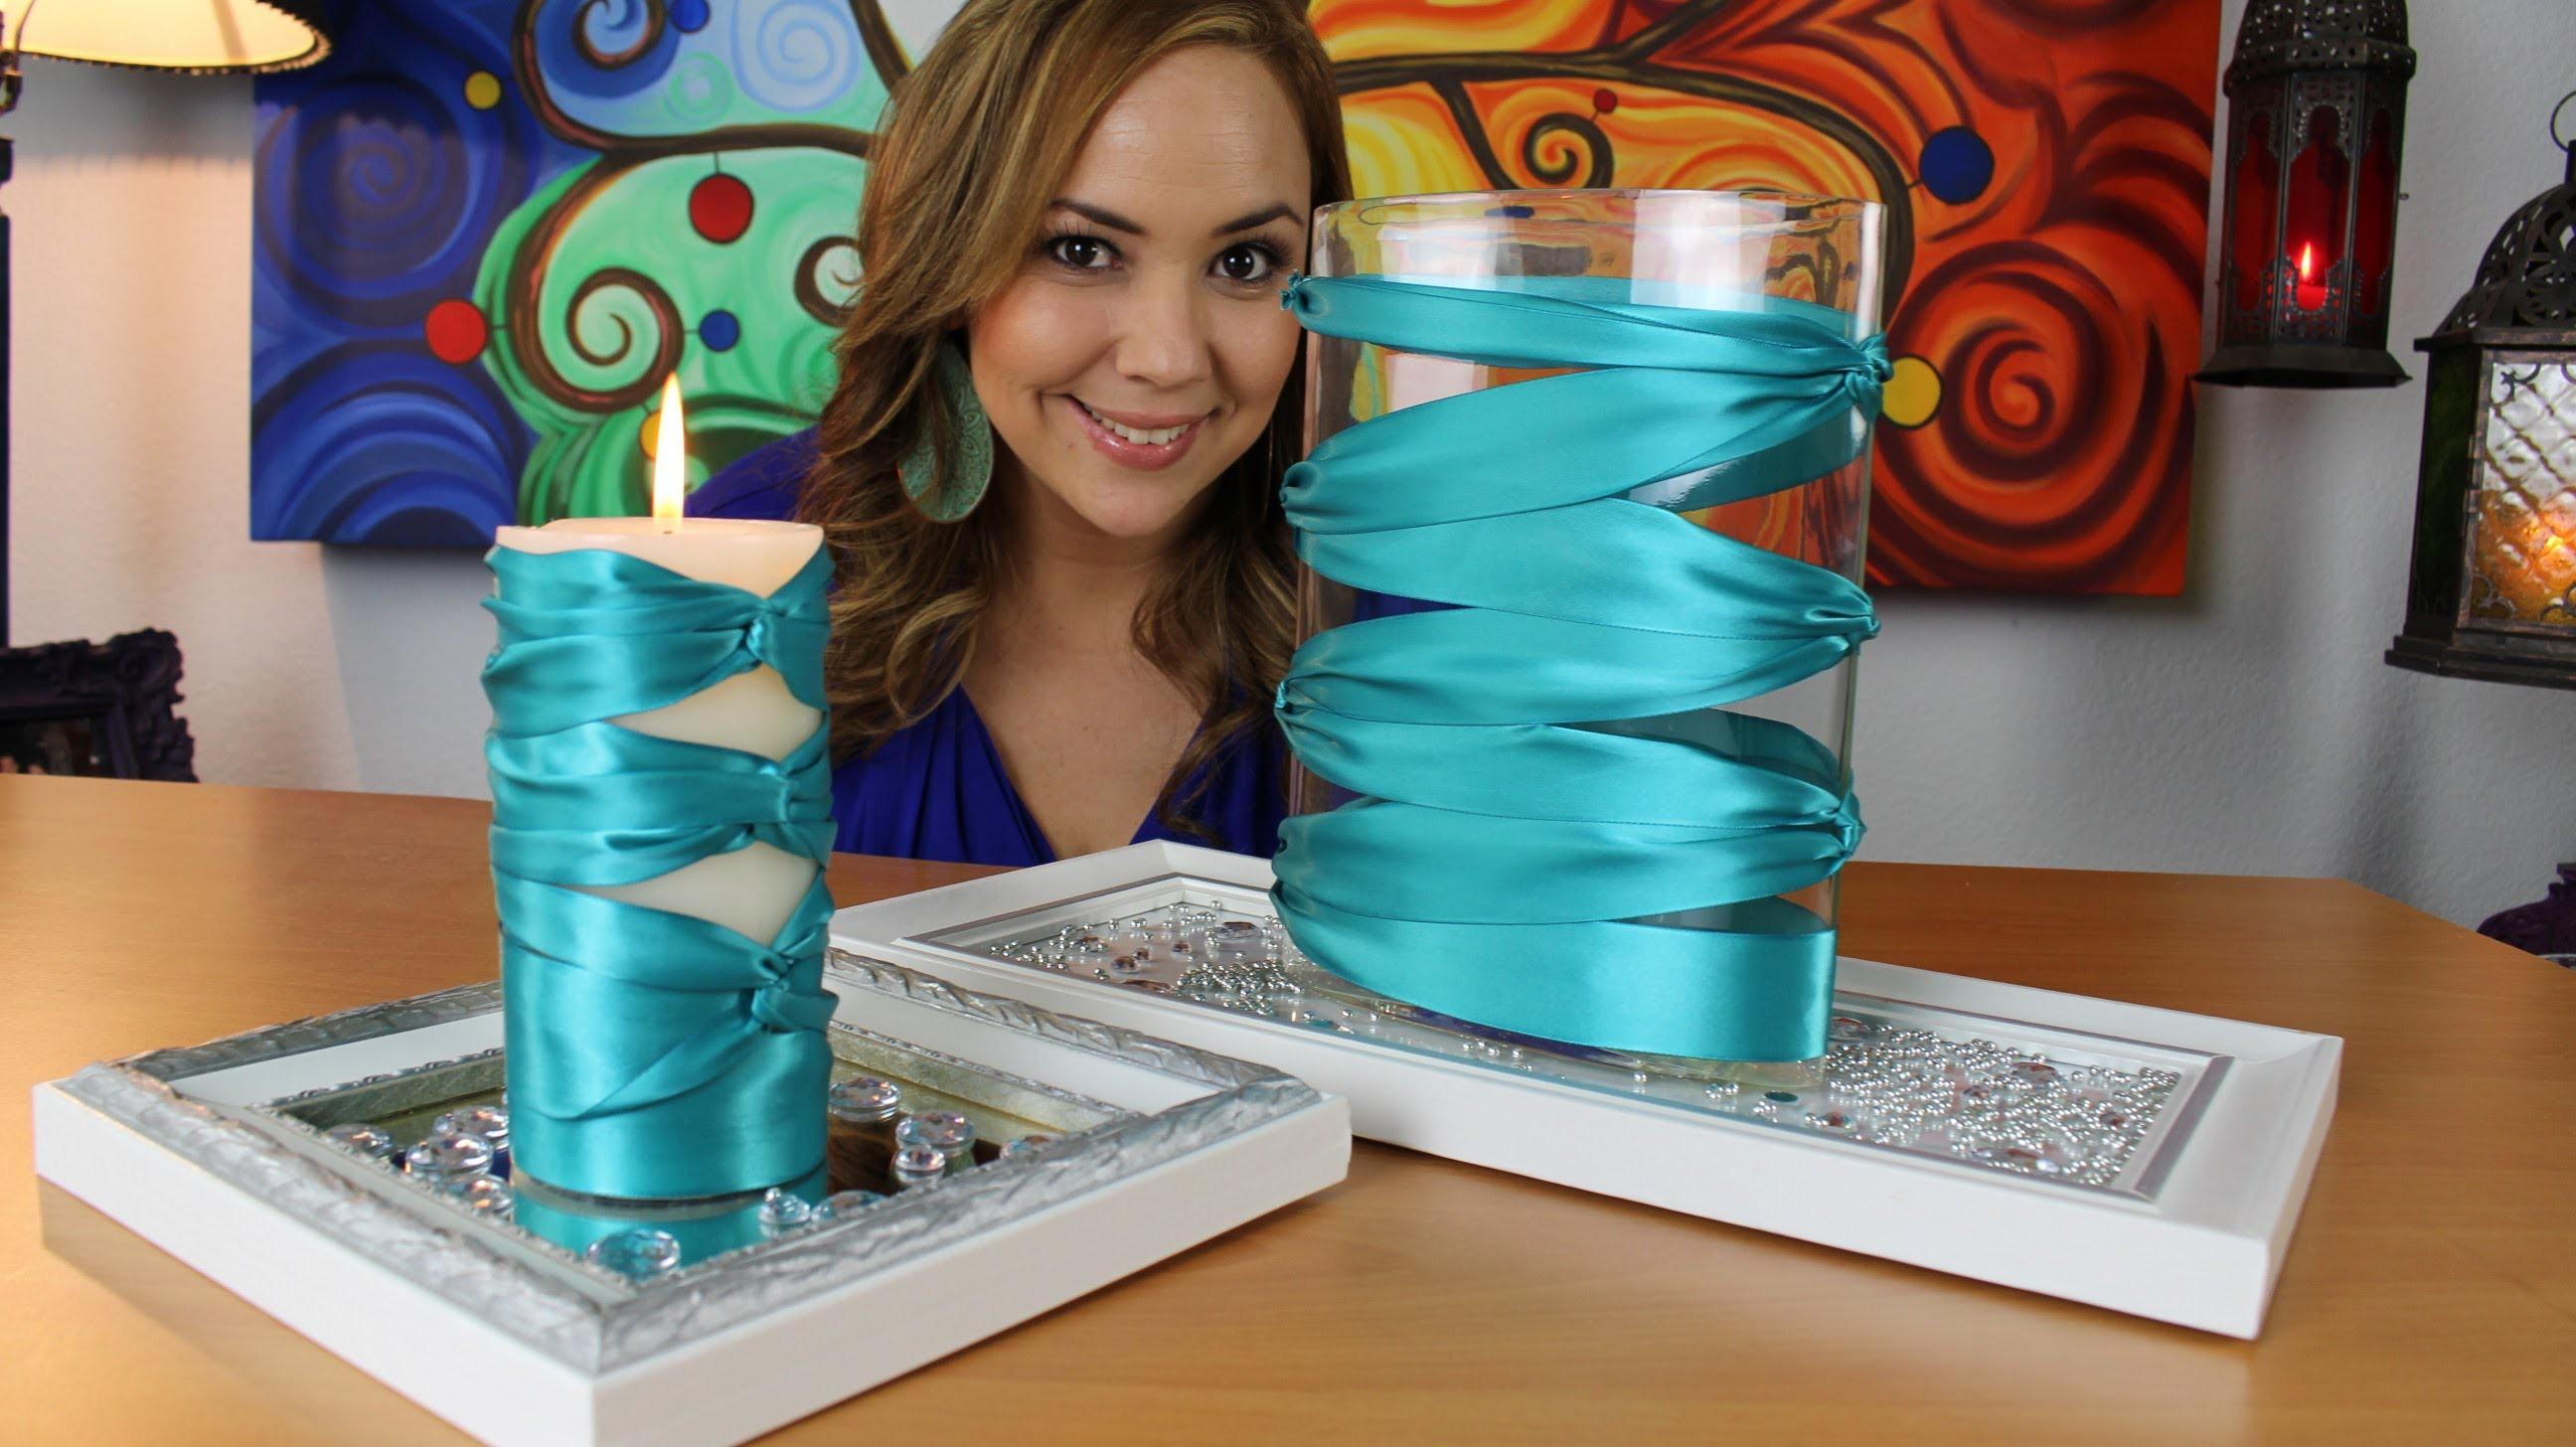 Elegantes Centros de mesa con Liston. Elegant Center piece with ribbon